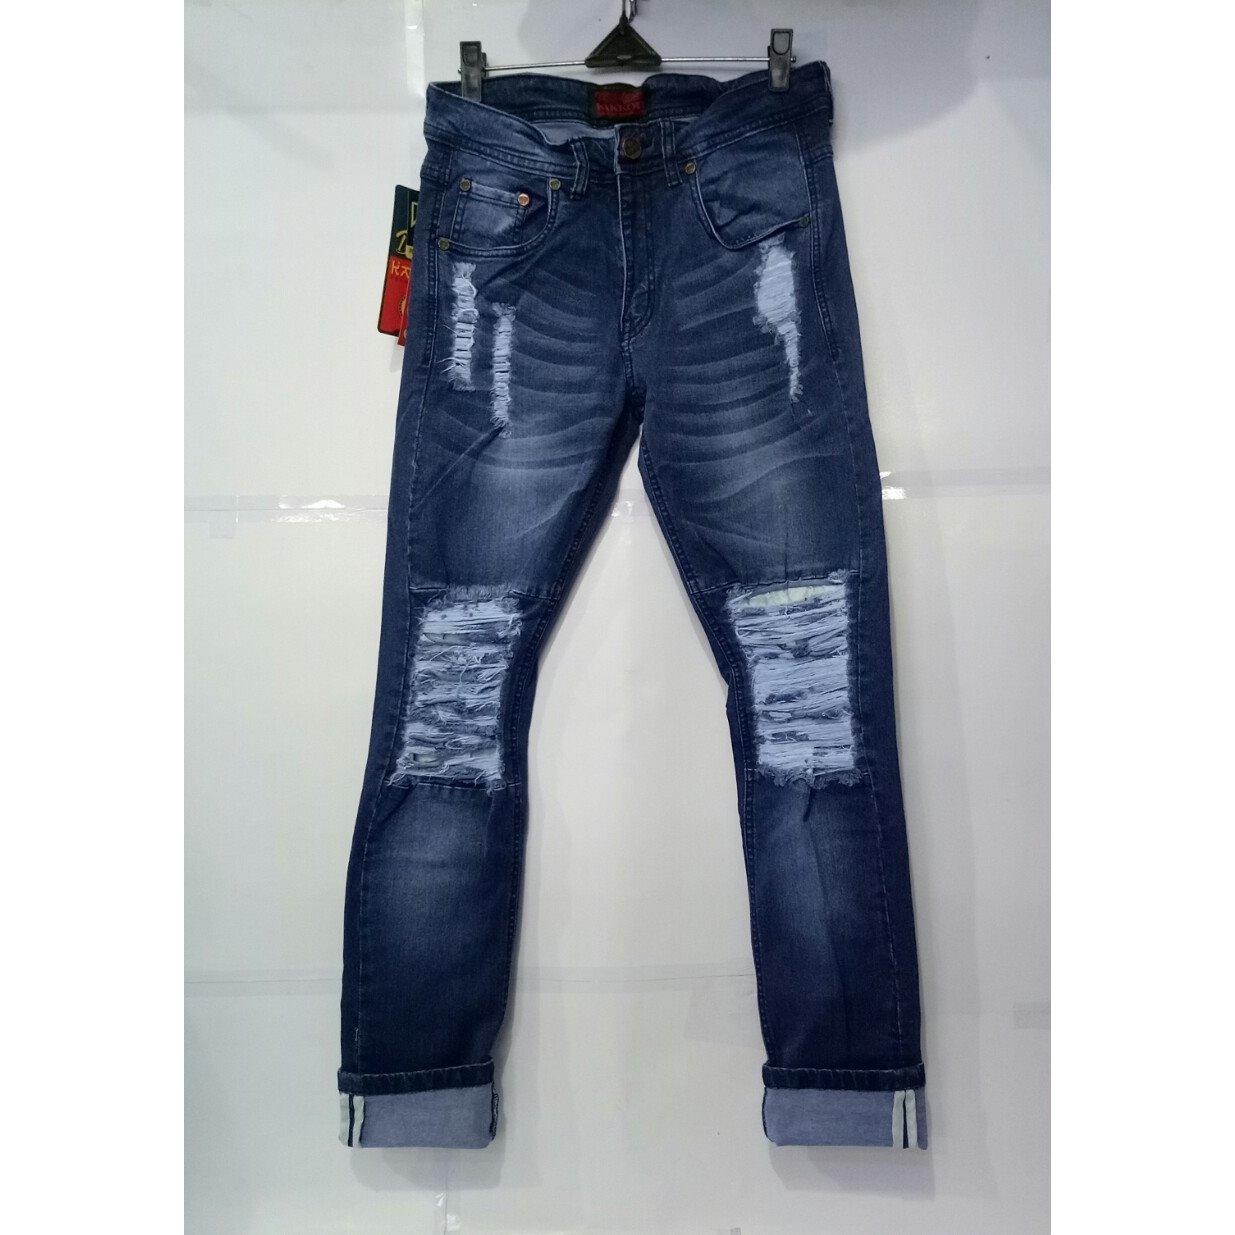 Beli Celana Jeans Pria Sobek Lapis Biru Dongker Yang Bagus